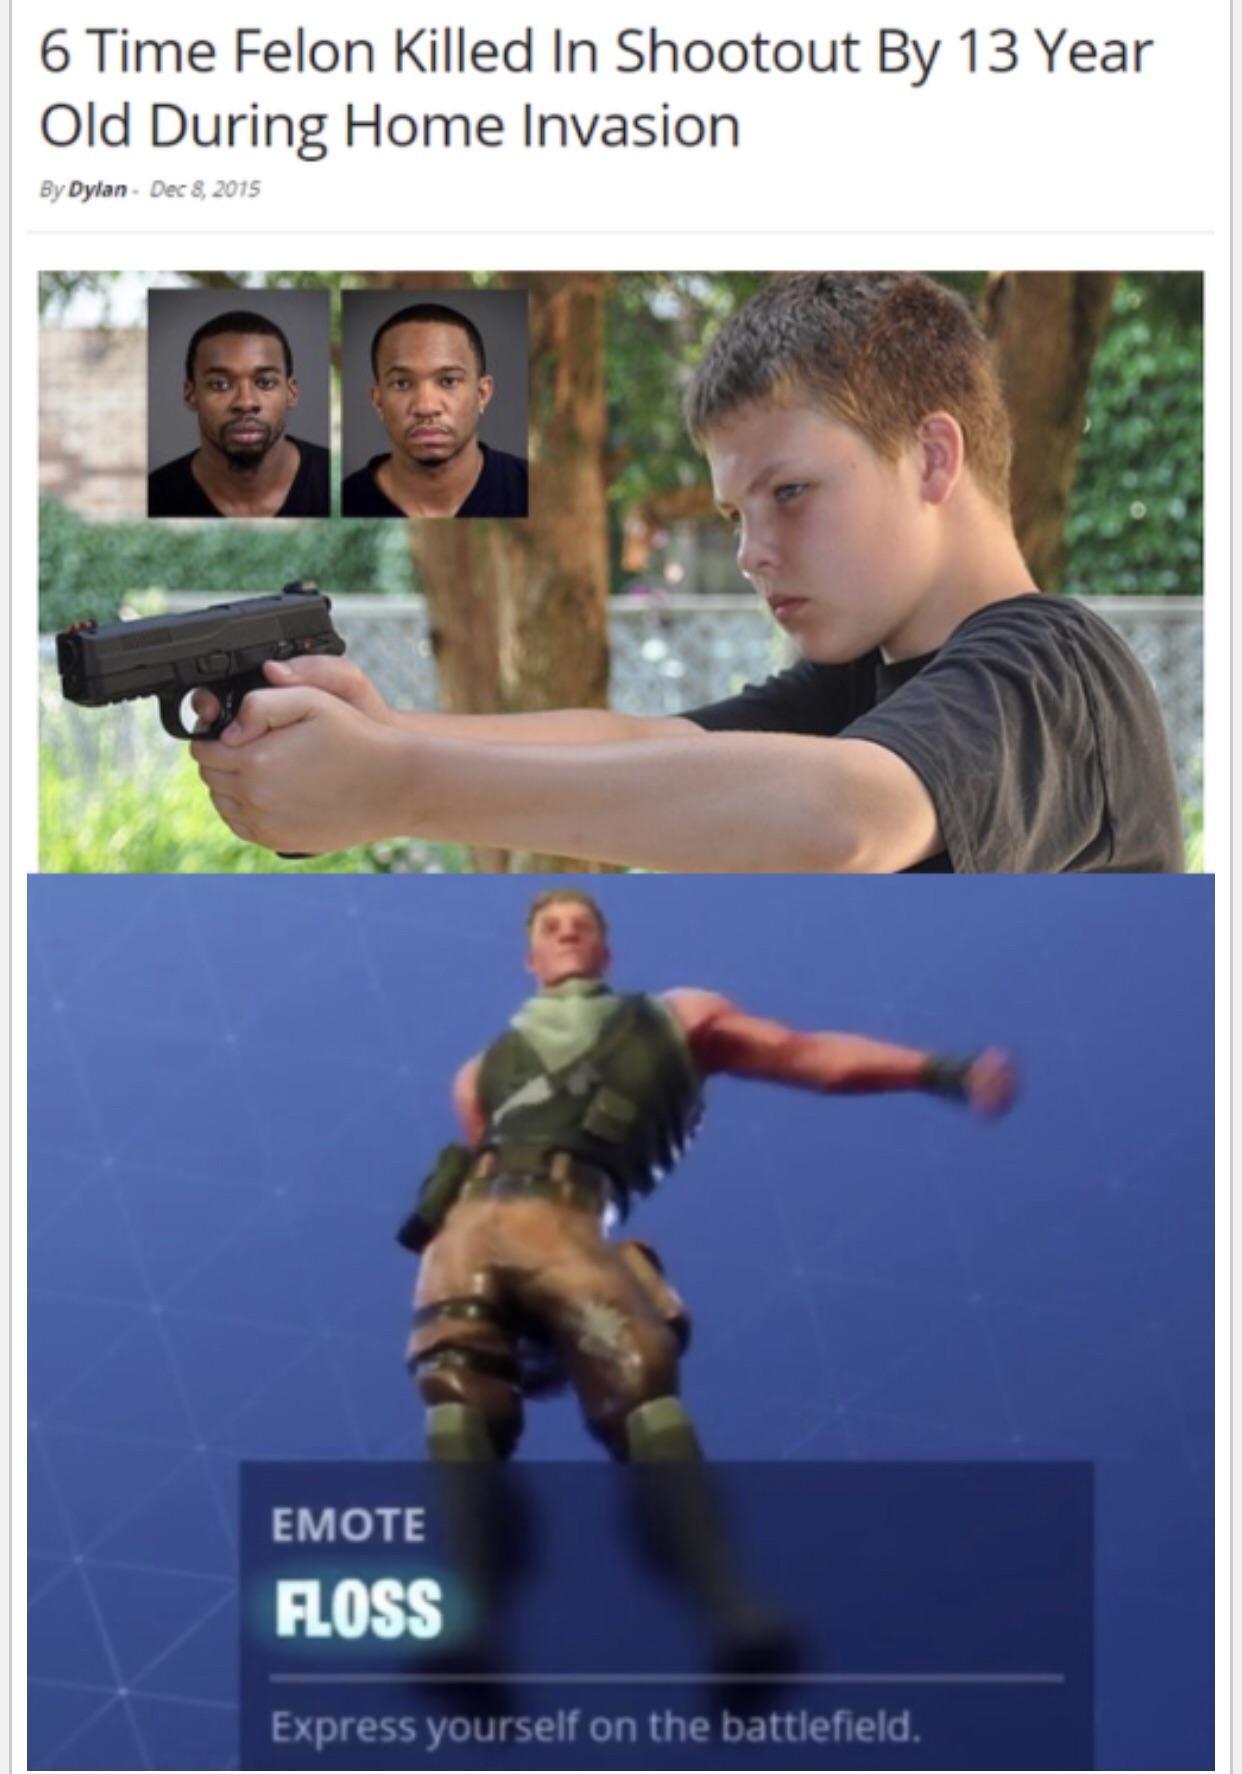 De - meme